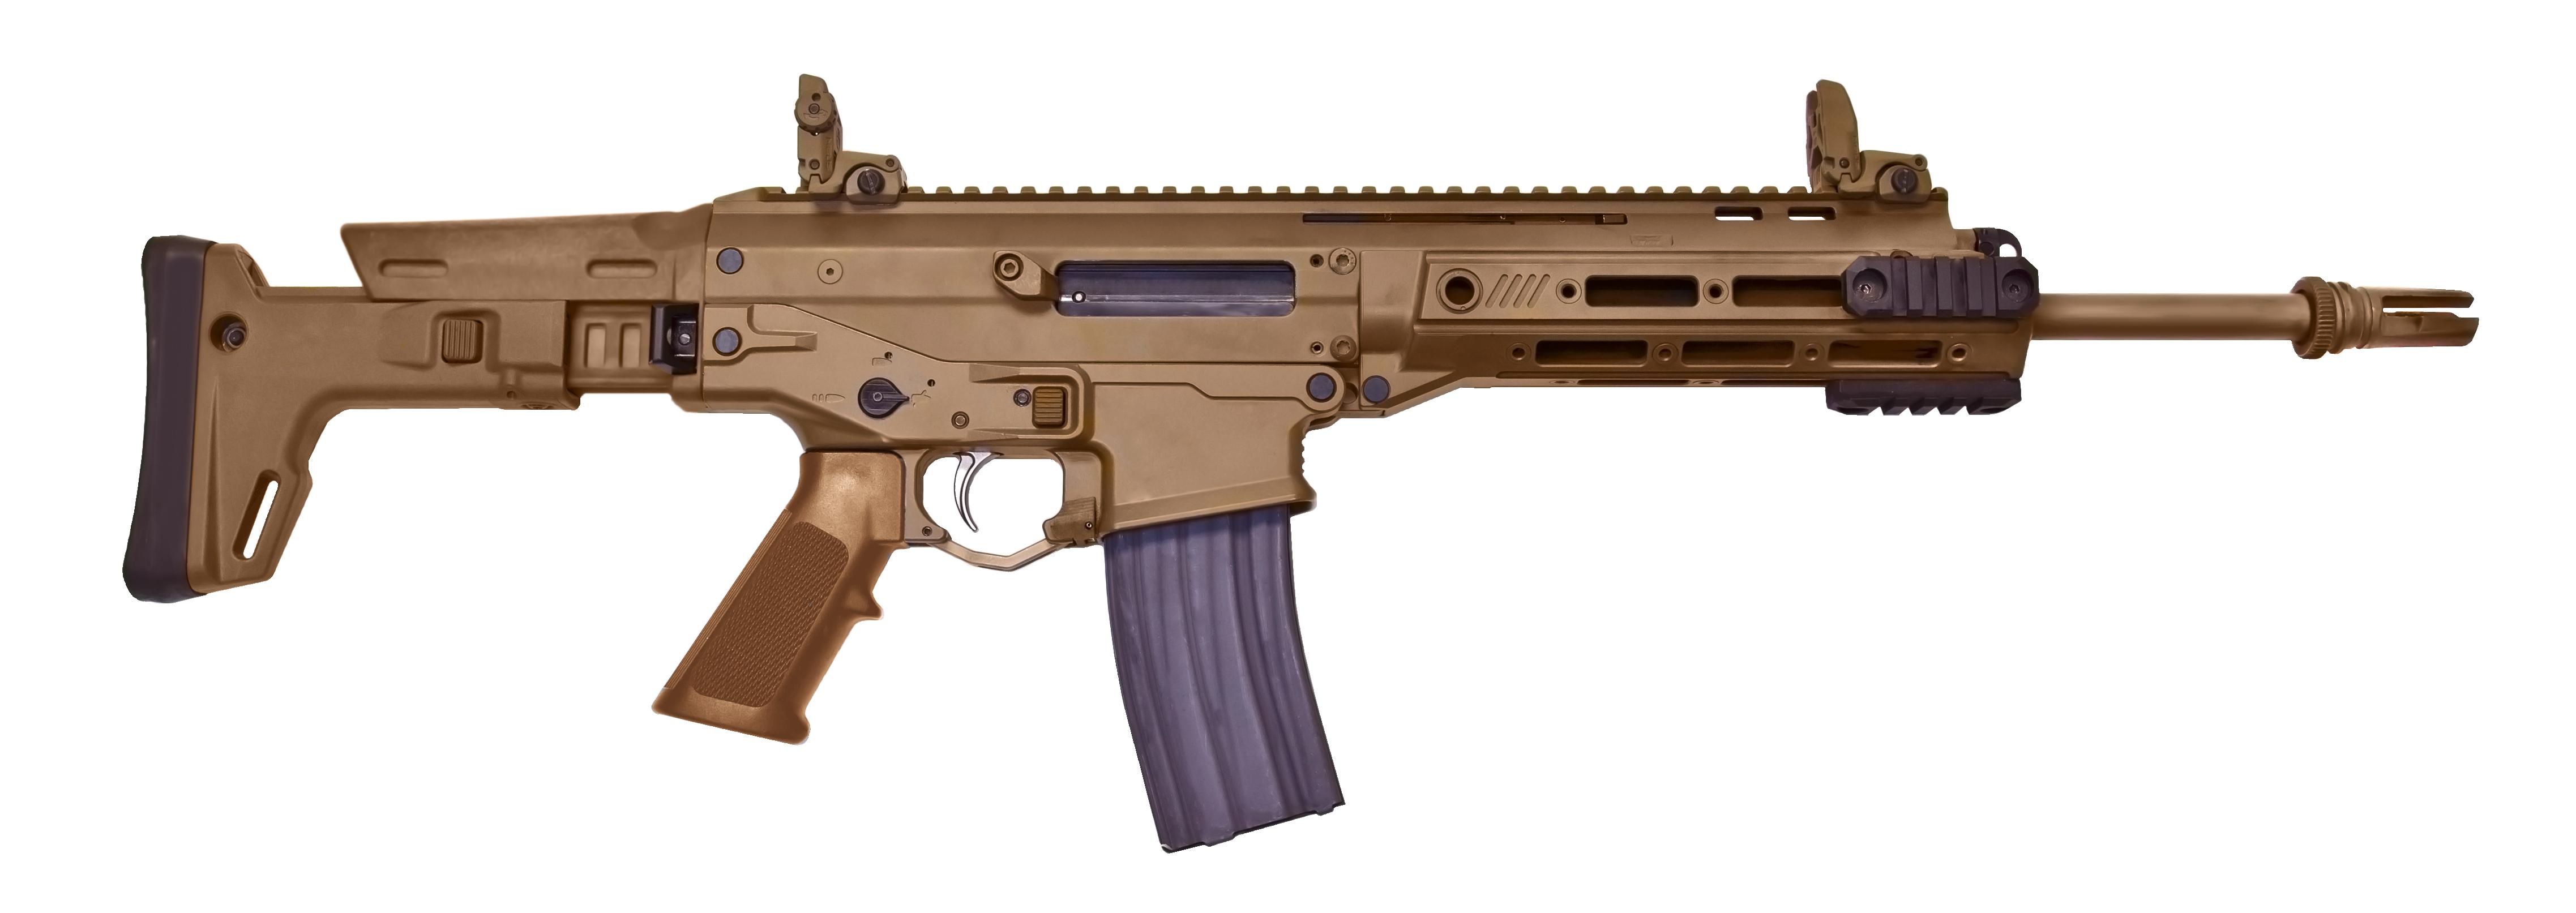 The Assault Rifles Of Near Future 21st Century Asian